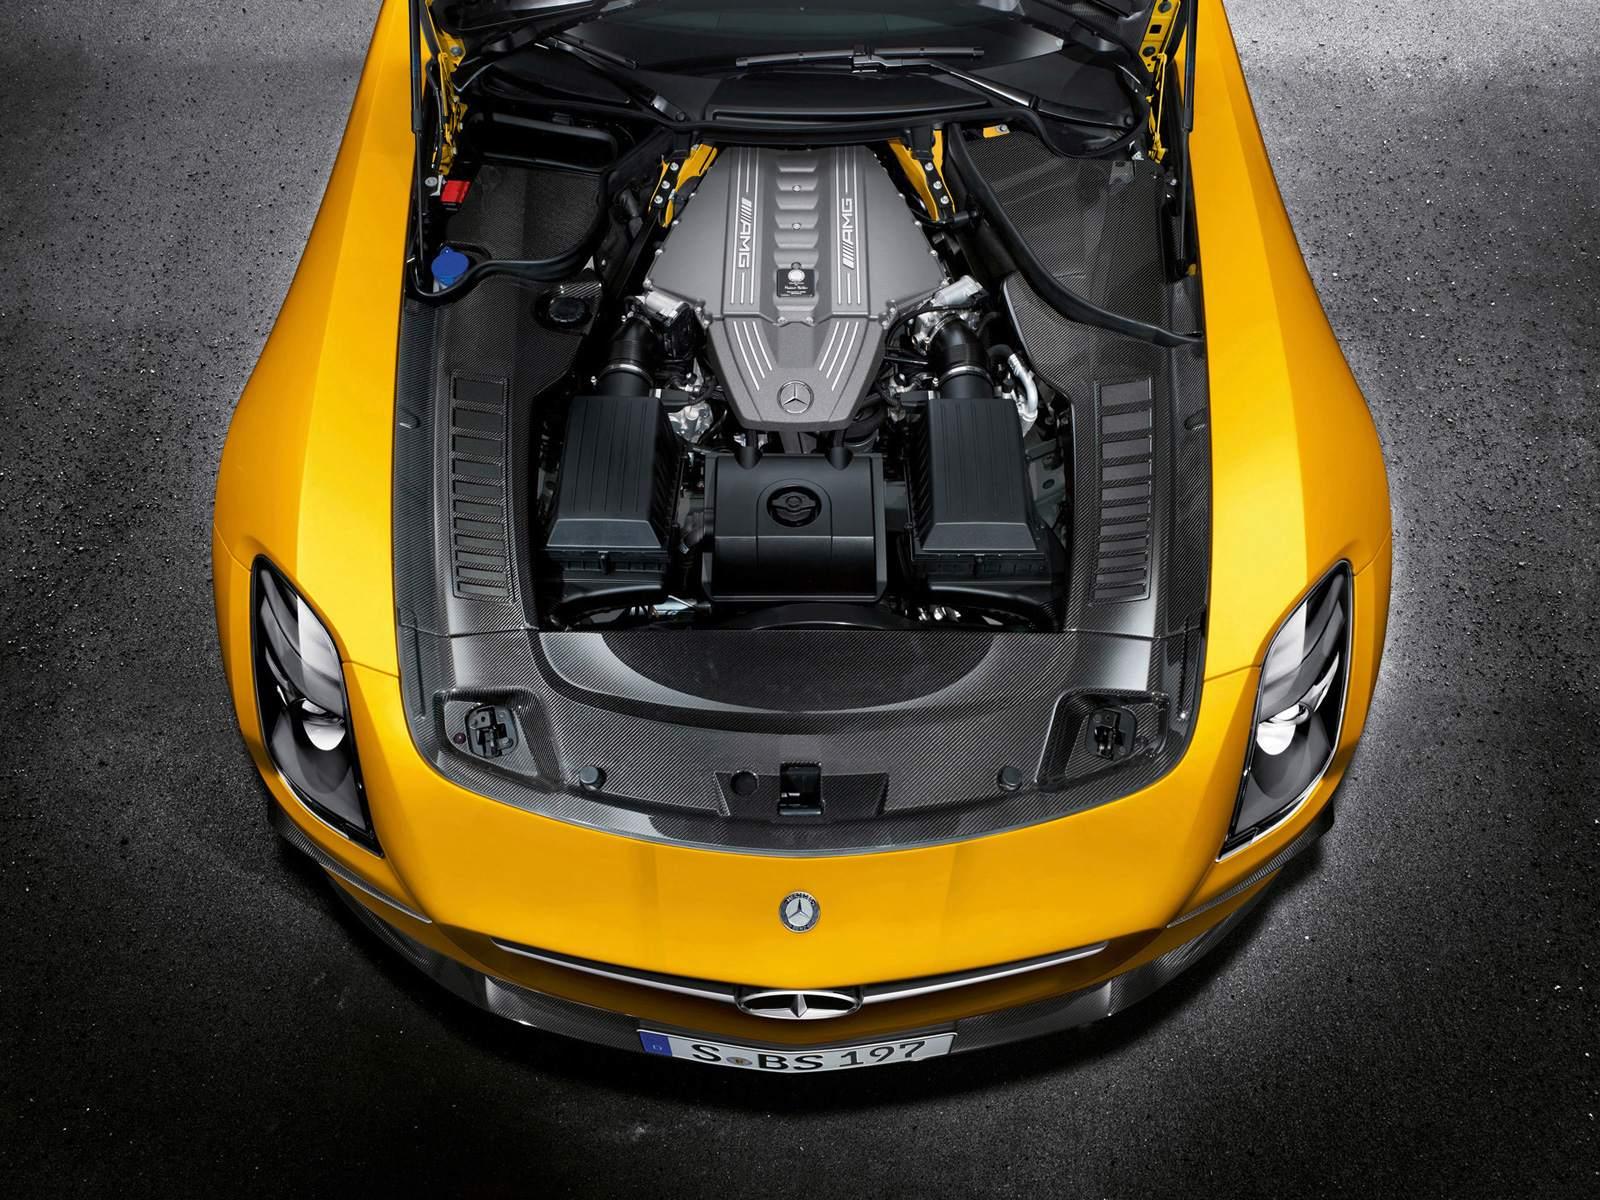 http://3.bp.blogspot.com/-GbZ6Wdldudo/UT8fmZeSzYI/AAAAAAAADu0/6xWnqH34TII/s1600/Black-Yellow-Mercedes-Benz-SLS-AMG-Wallpaper-hd.jpg